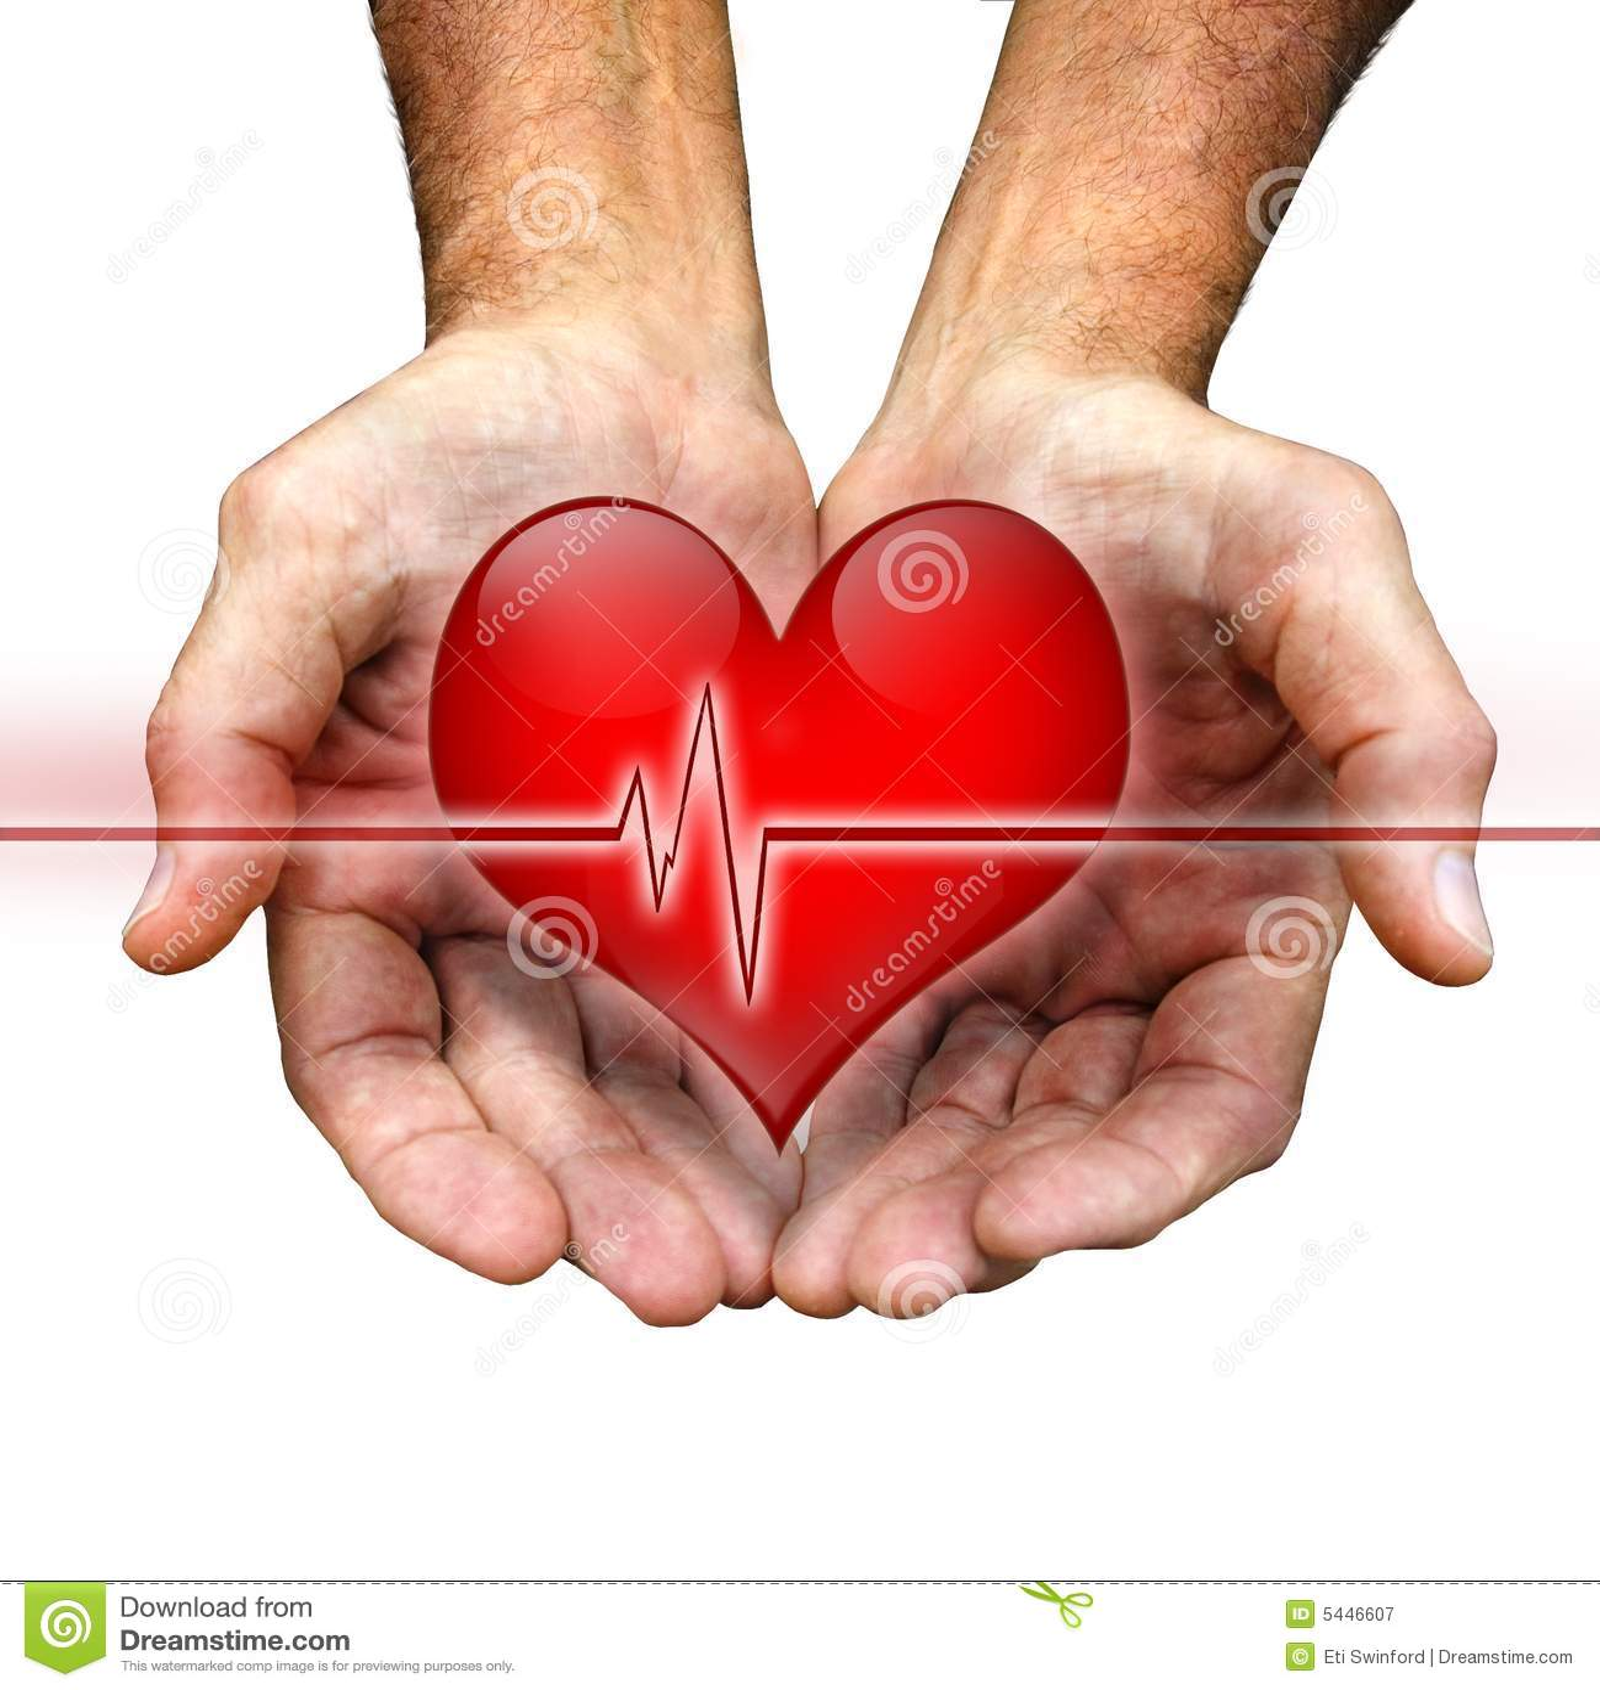 Healing hands stock image image of cardiac industries 5446607 healing hands buycottarizona Image collections